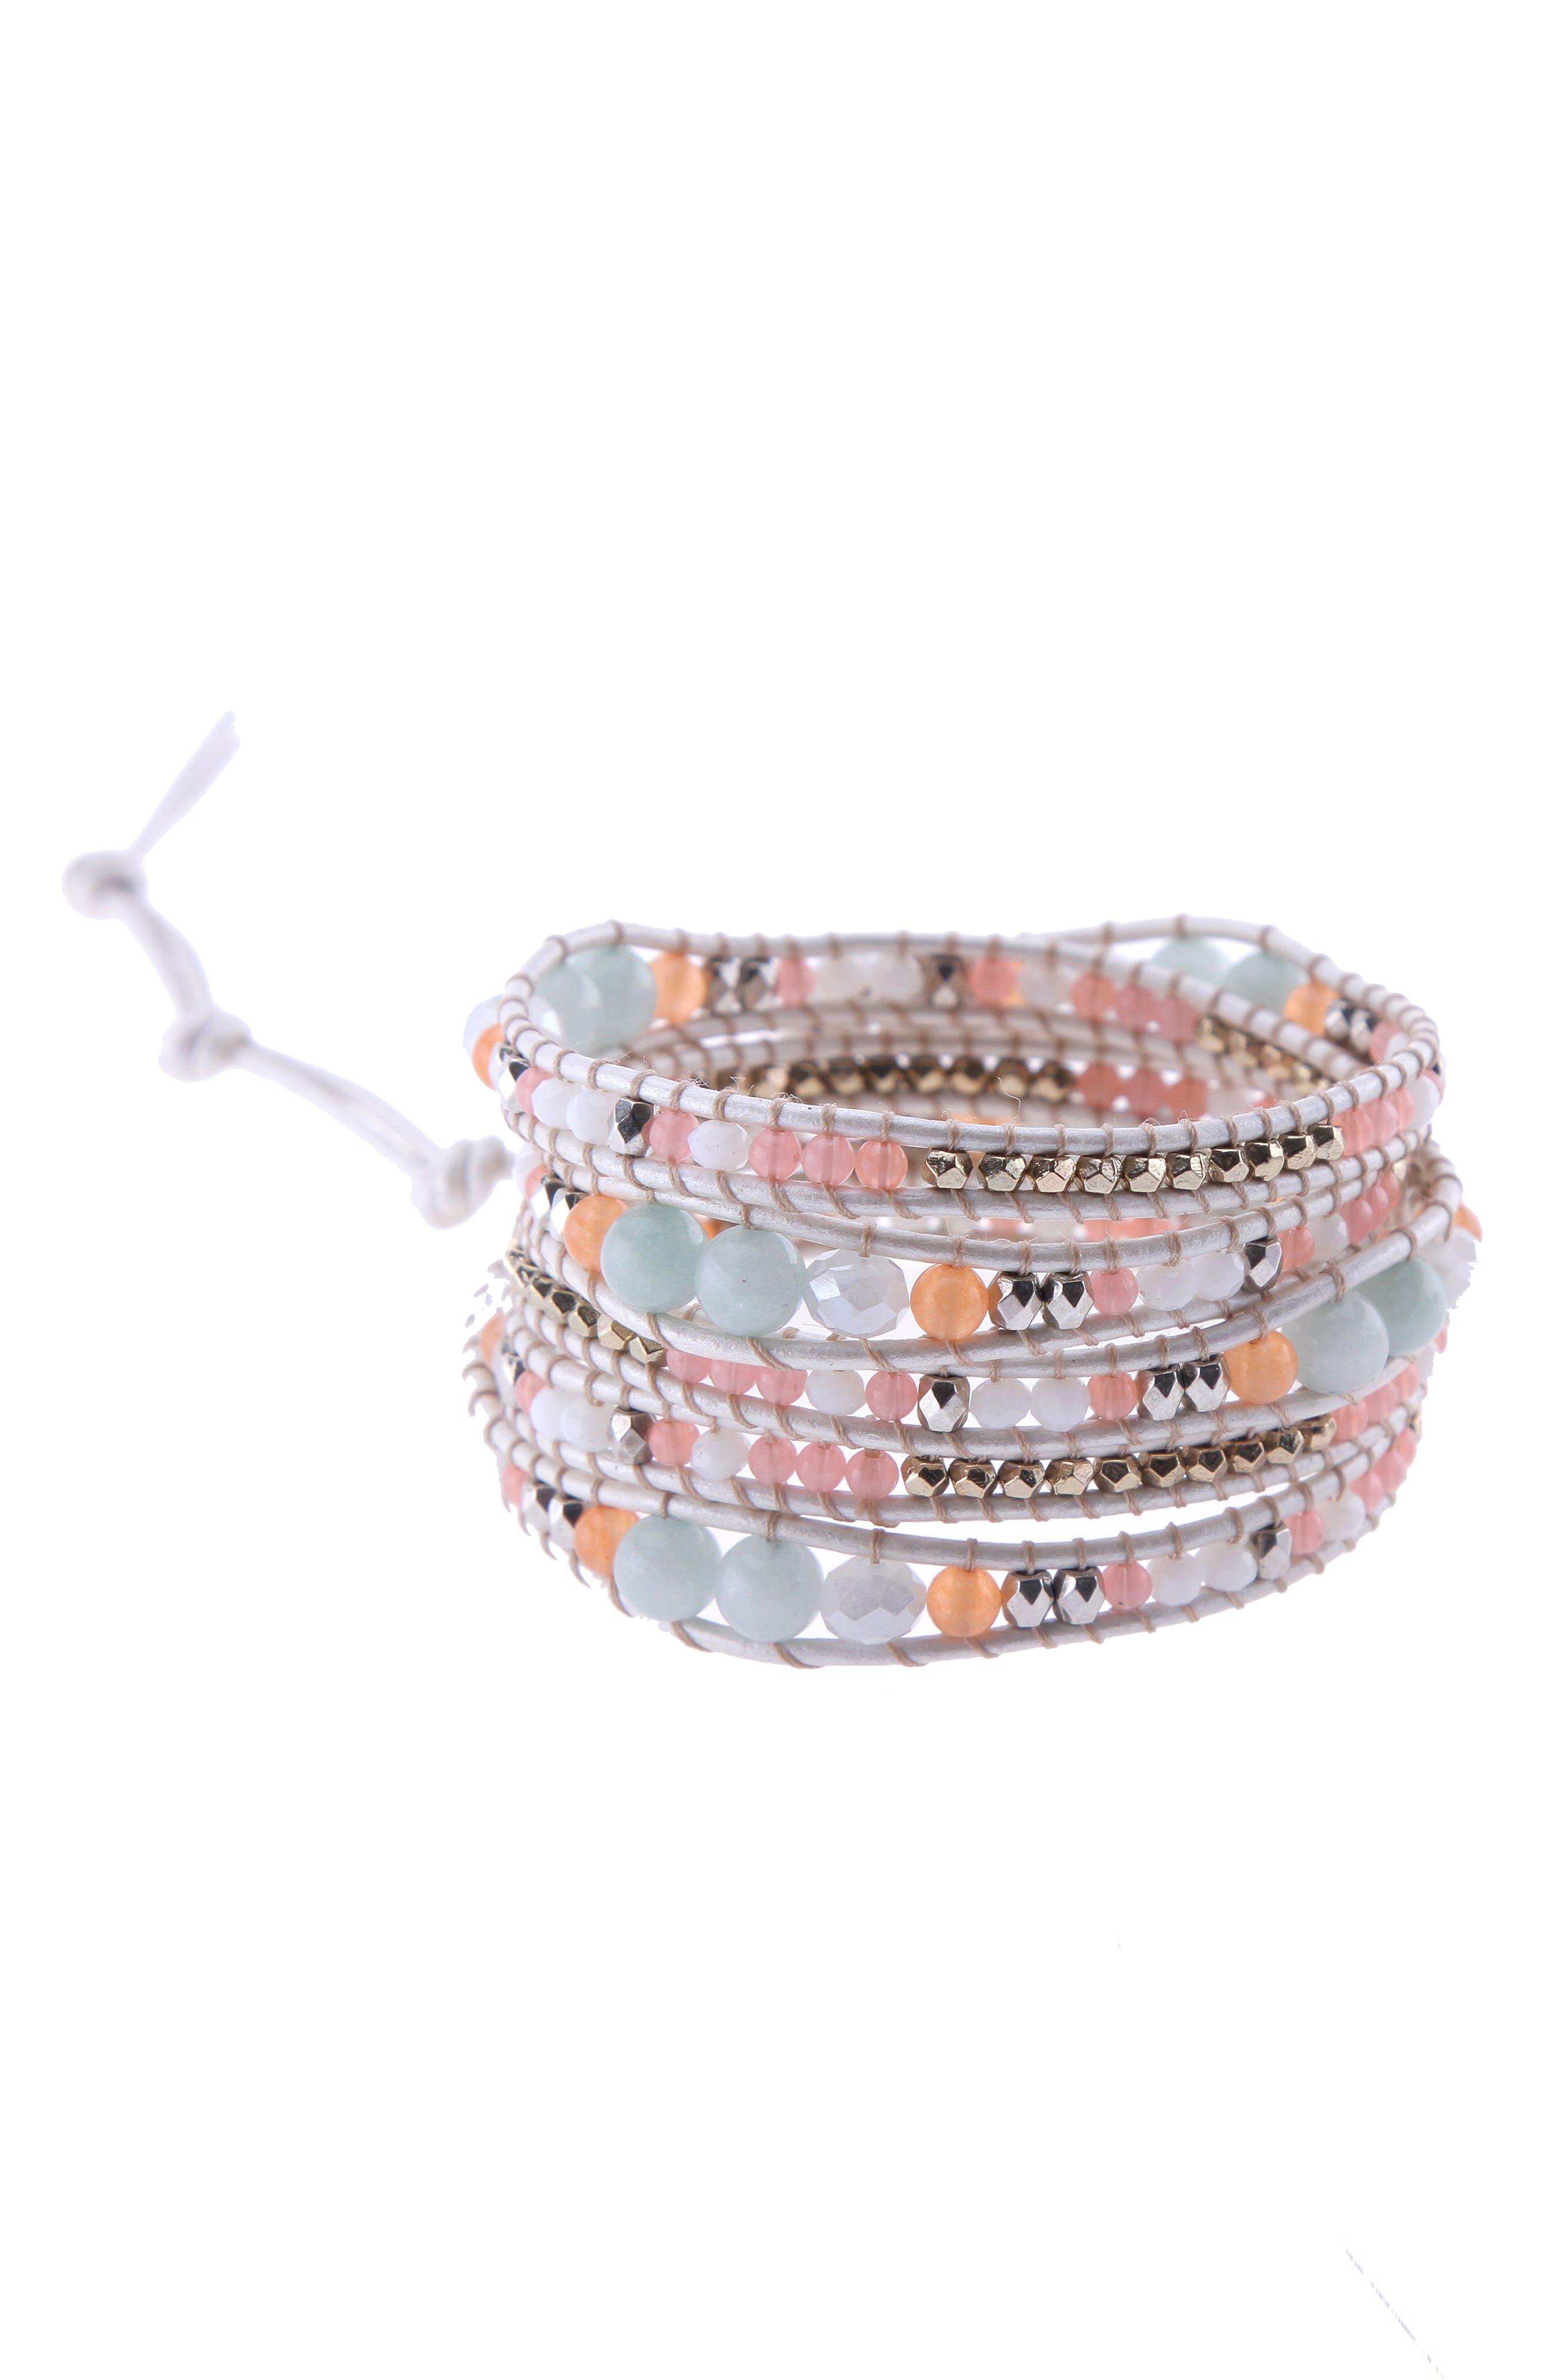 Beaded Agate Wrap Bracelet,                             Main thumbnail 1, color,                             800